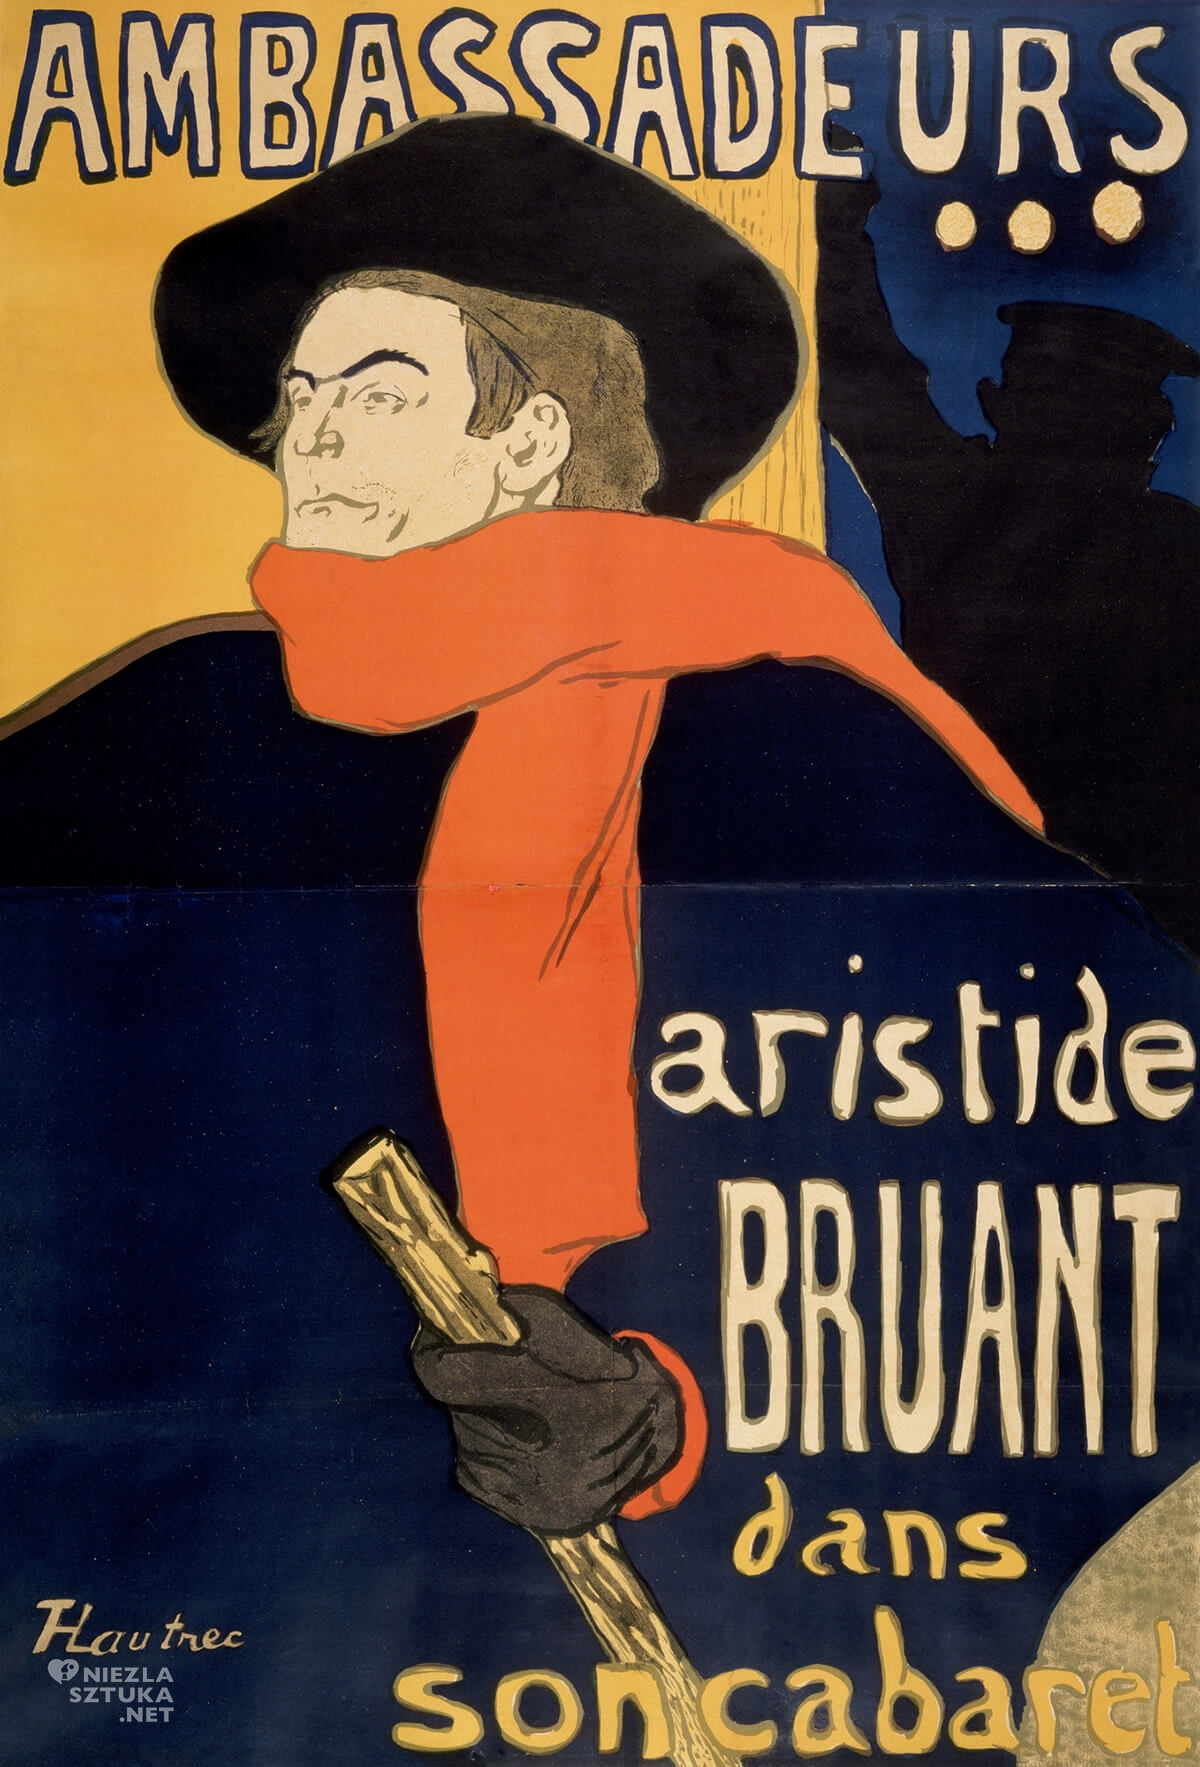 Henri de Toulouse Lautrec, Ambassadeurs, malarstwo francuskie, sztuka francuska, Niezła Sztuka